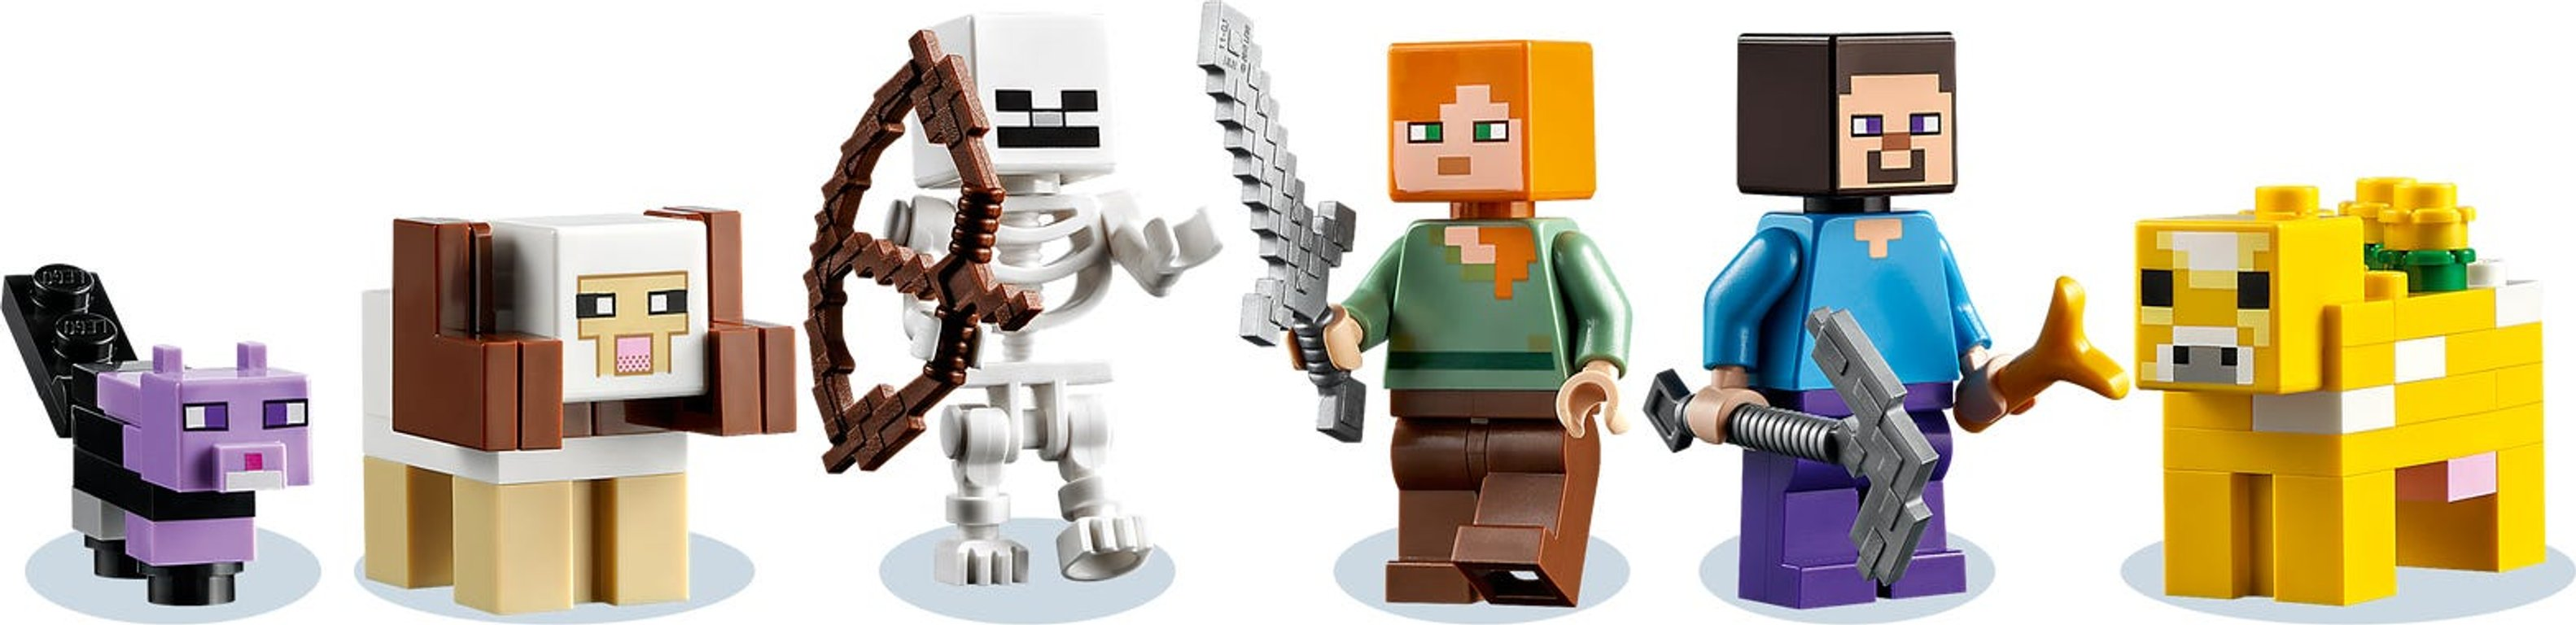 LEGO® Minecraft The First Adventure minifigures